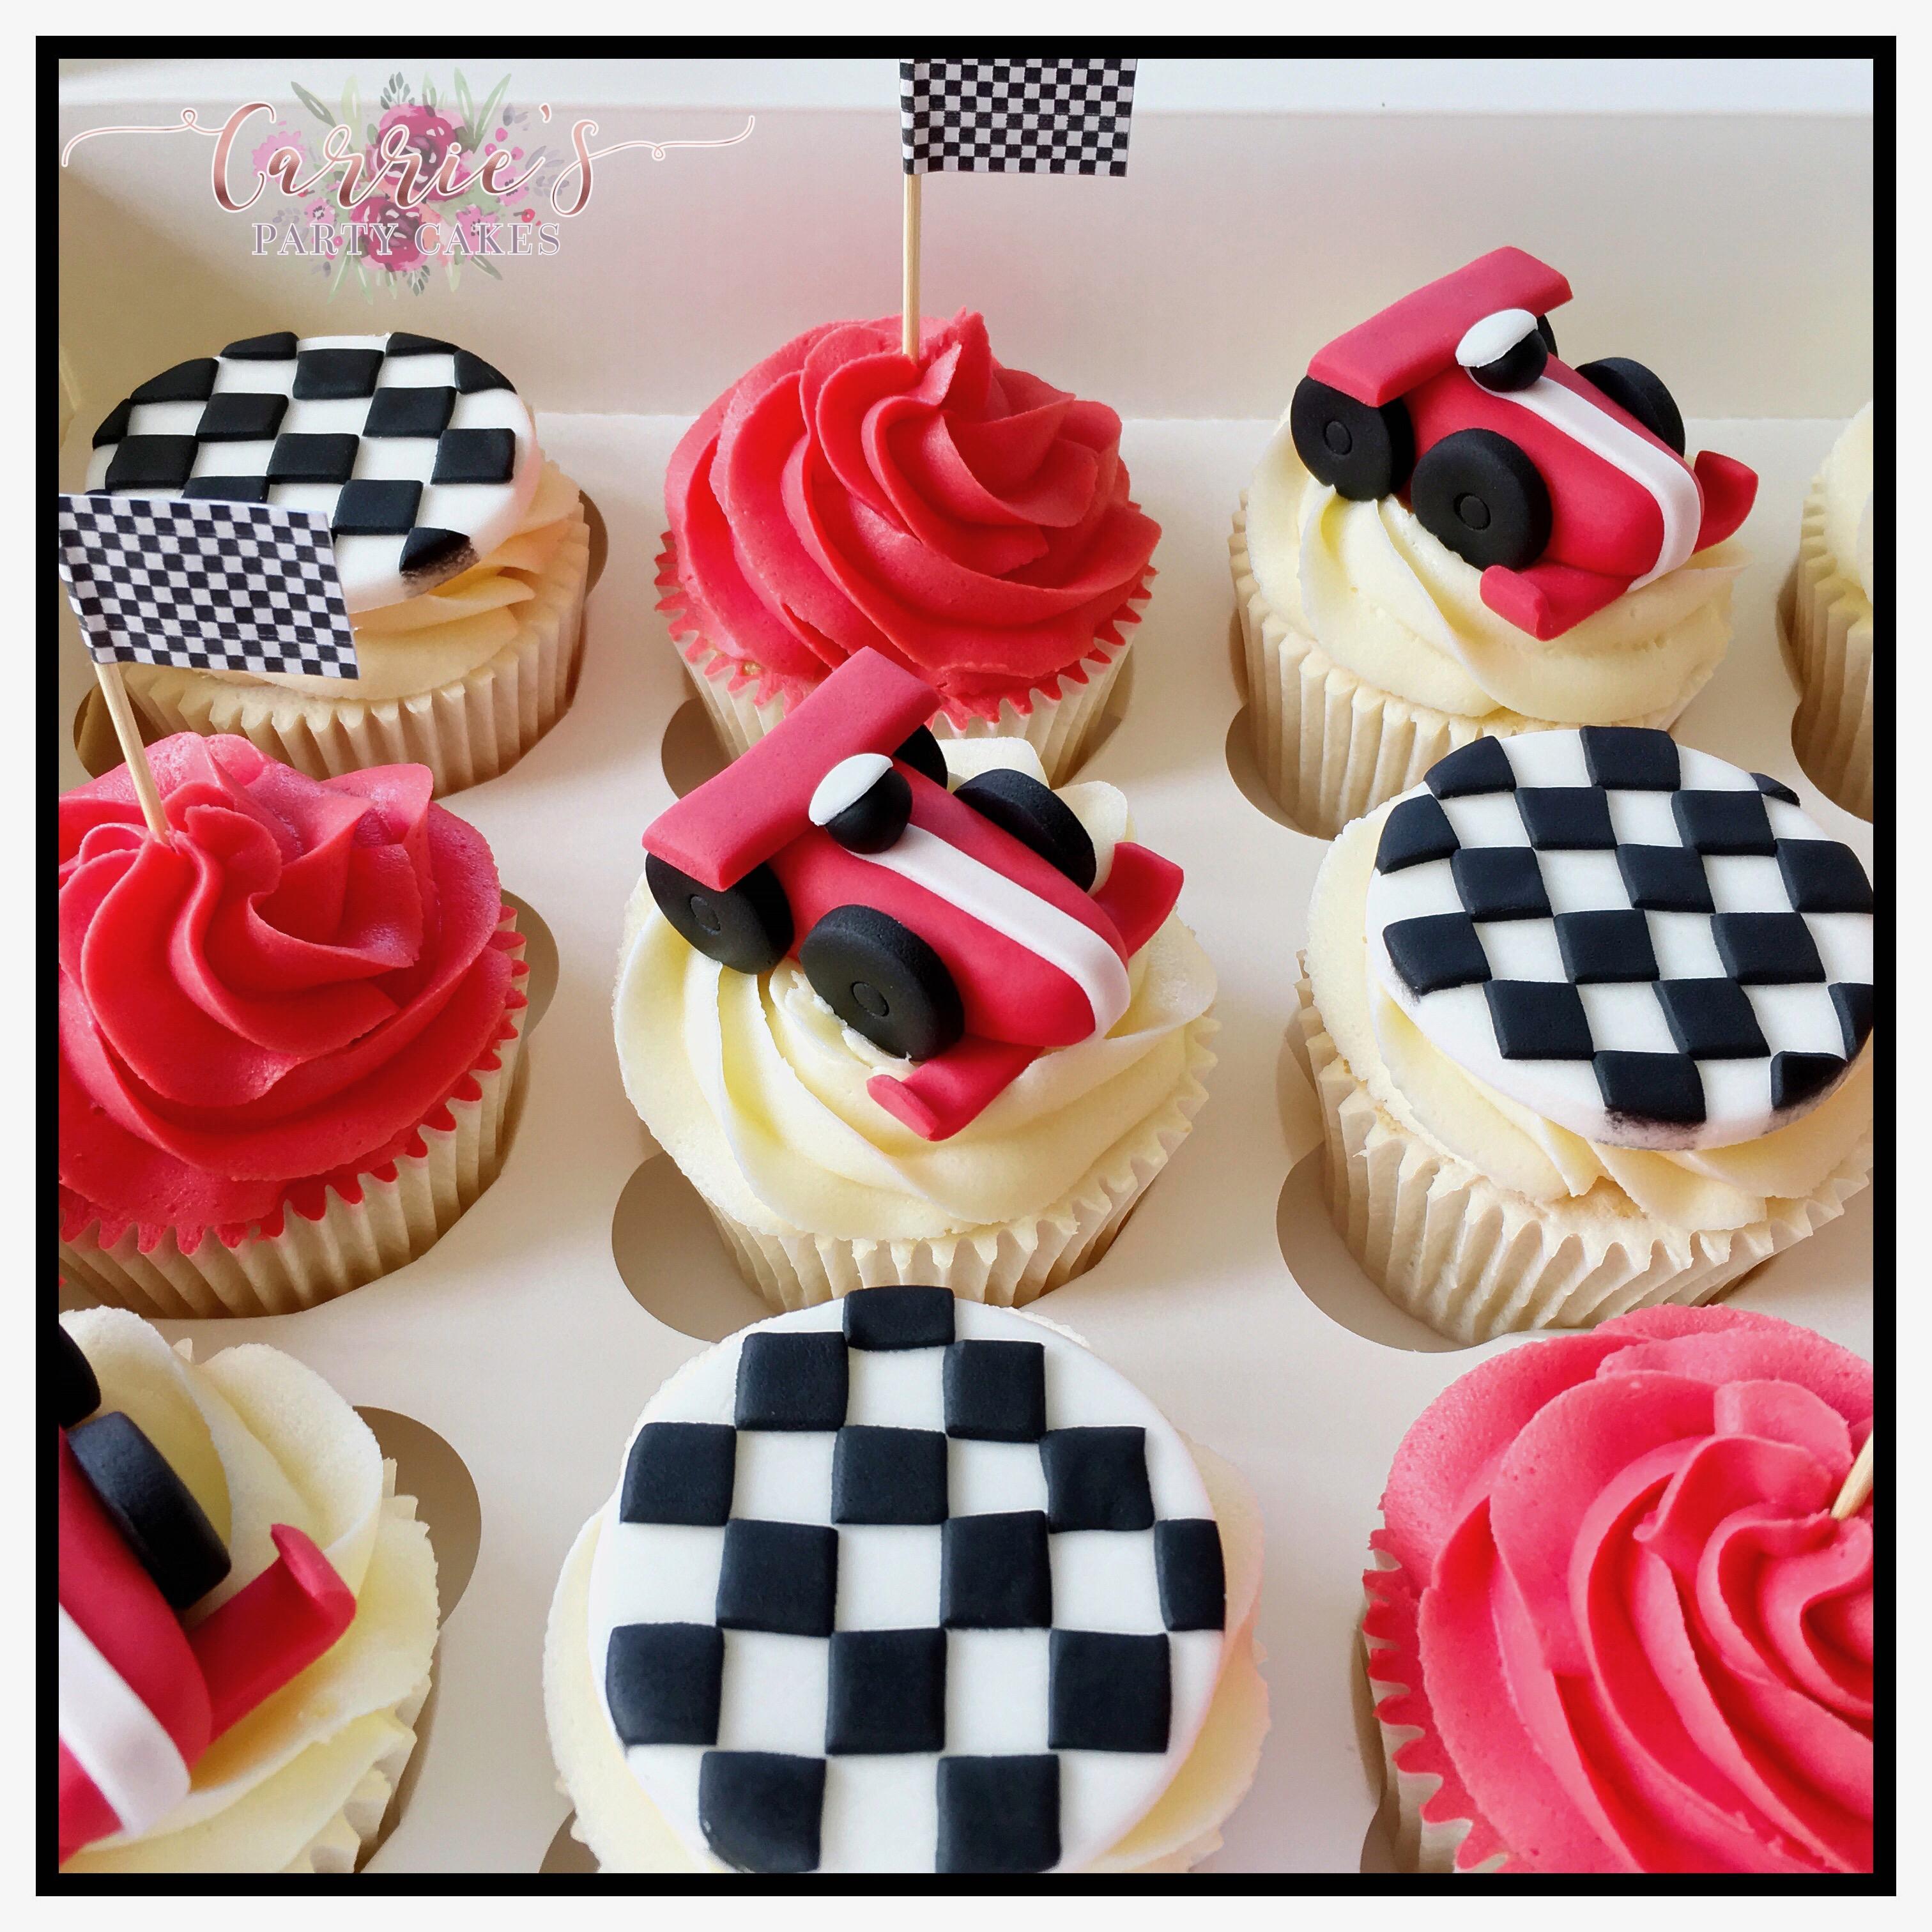 F1 cupcakes